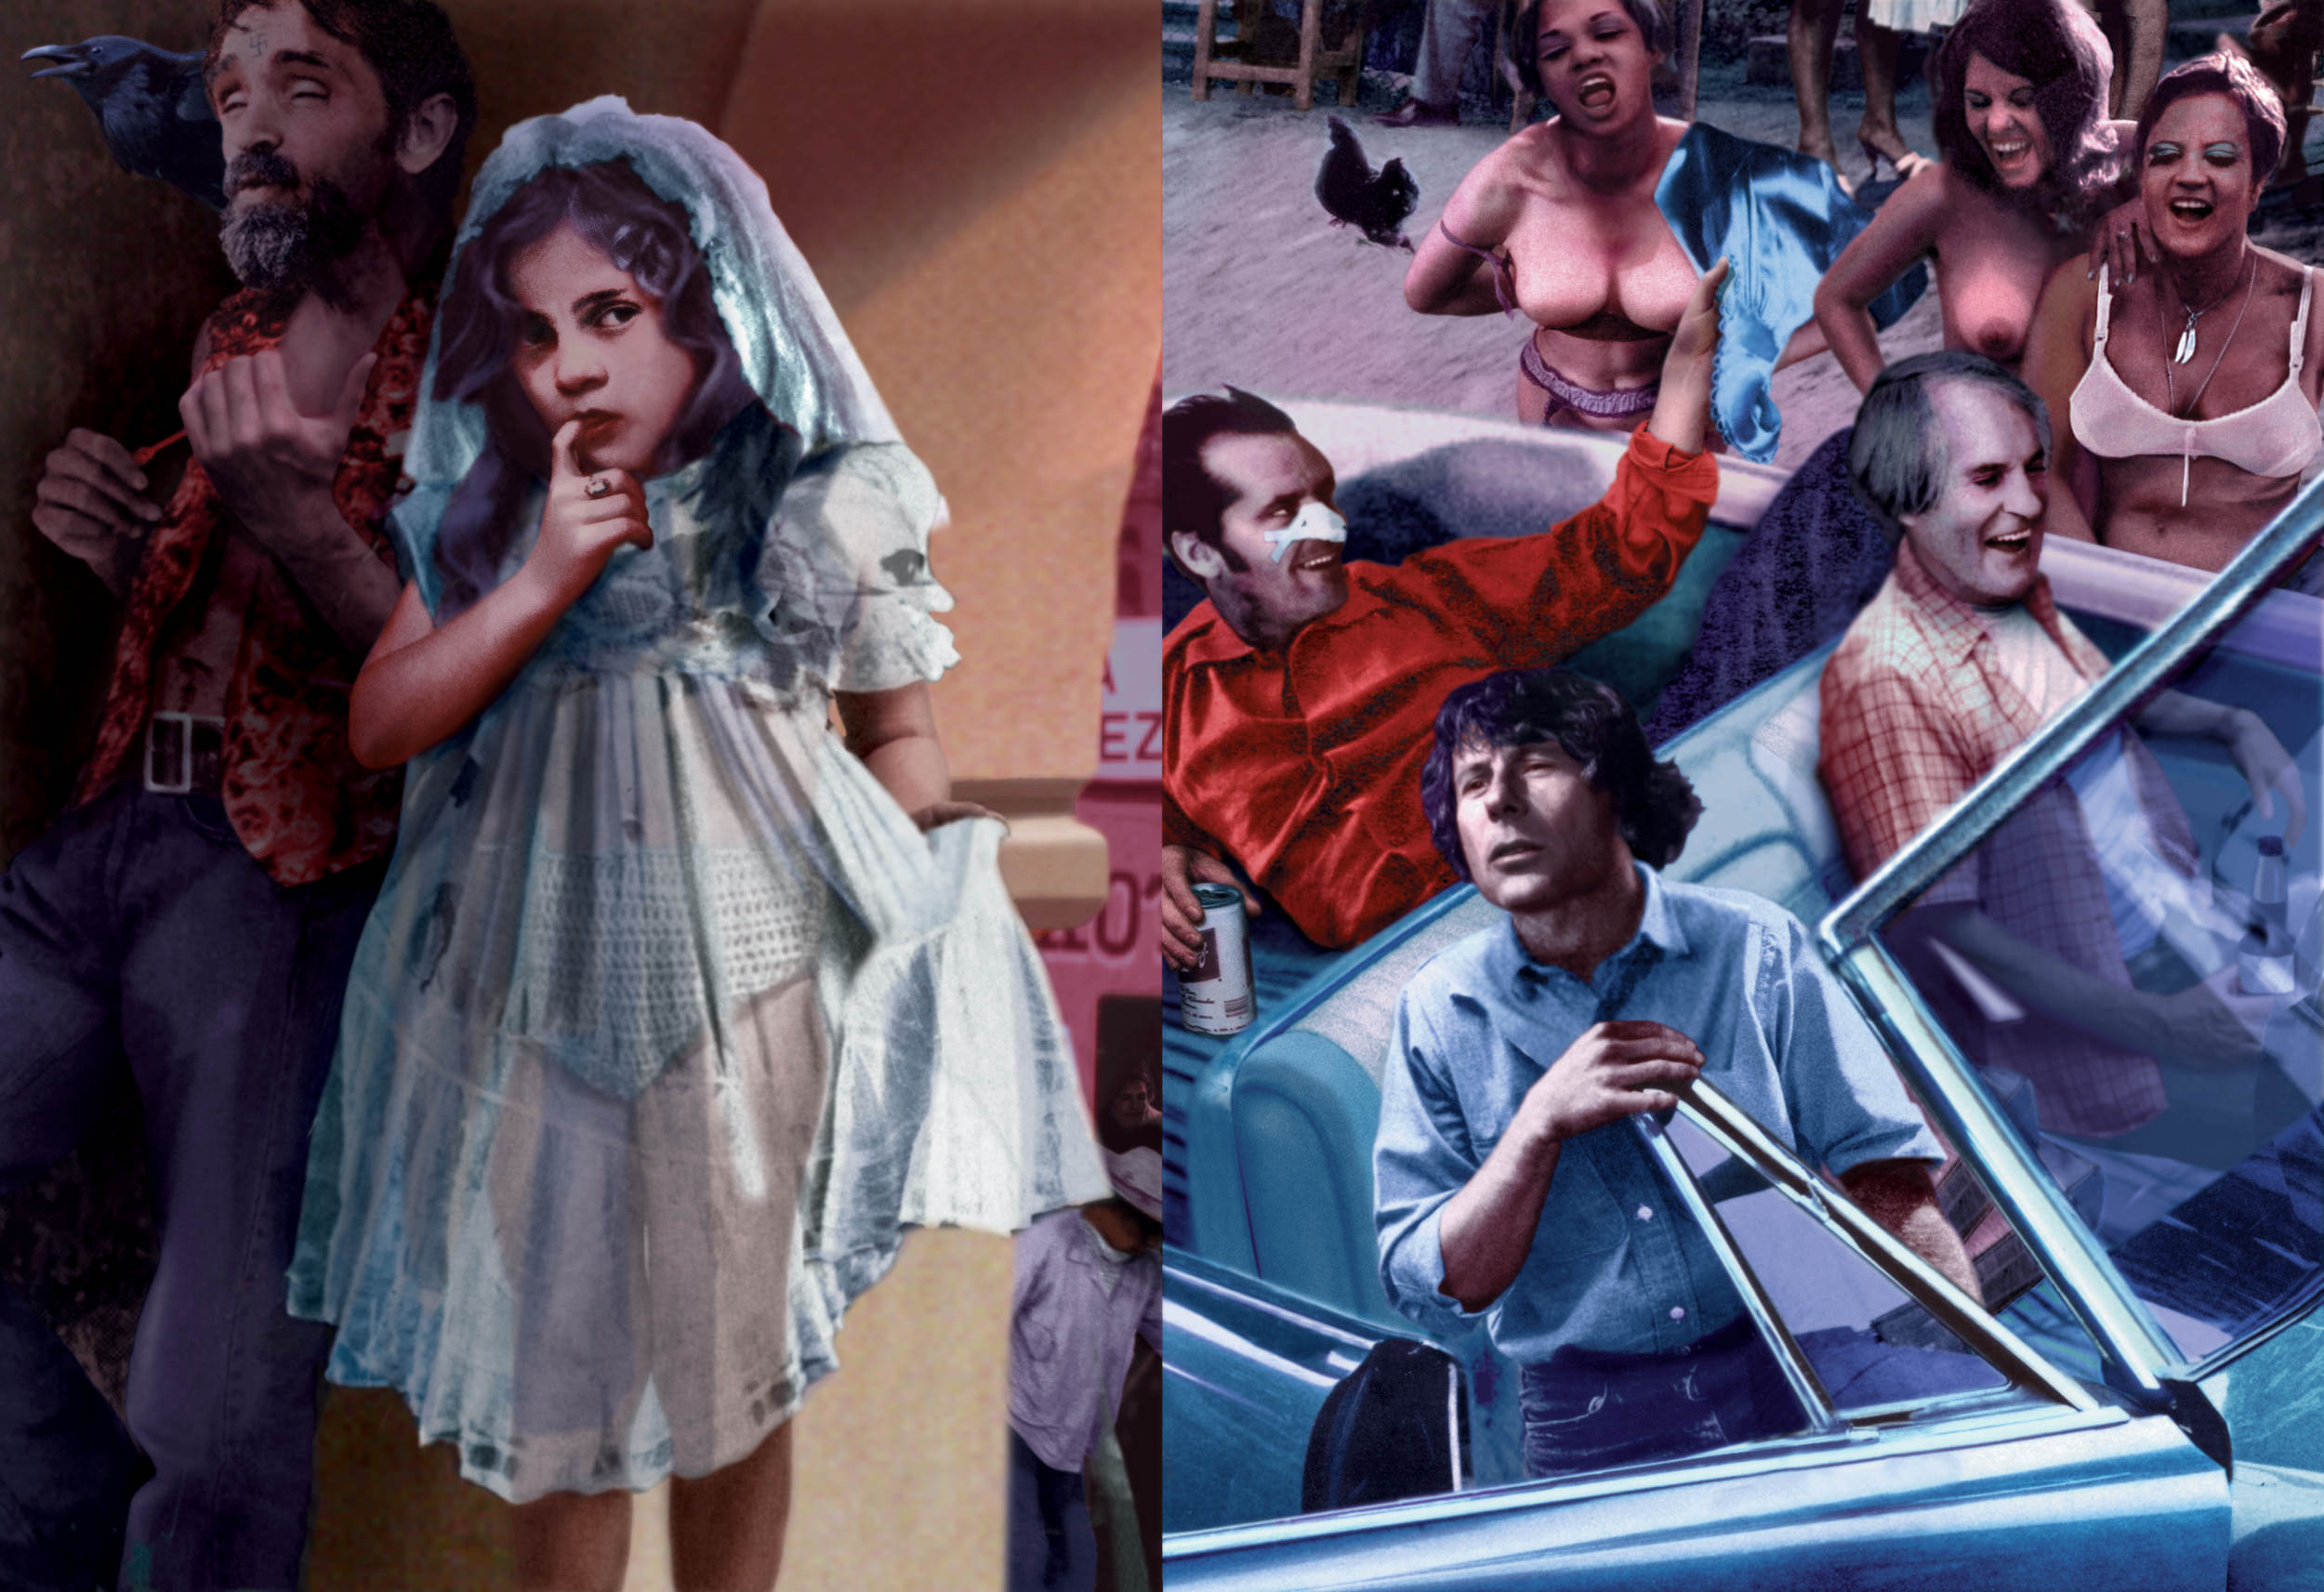 Guy Peellaert.  Tijuana  (Charles Manson, Jack Nicholson, Roman Polanski, Timothy Leary). From the  Twentieth Century Dreams series (1995-1999).